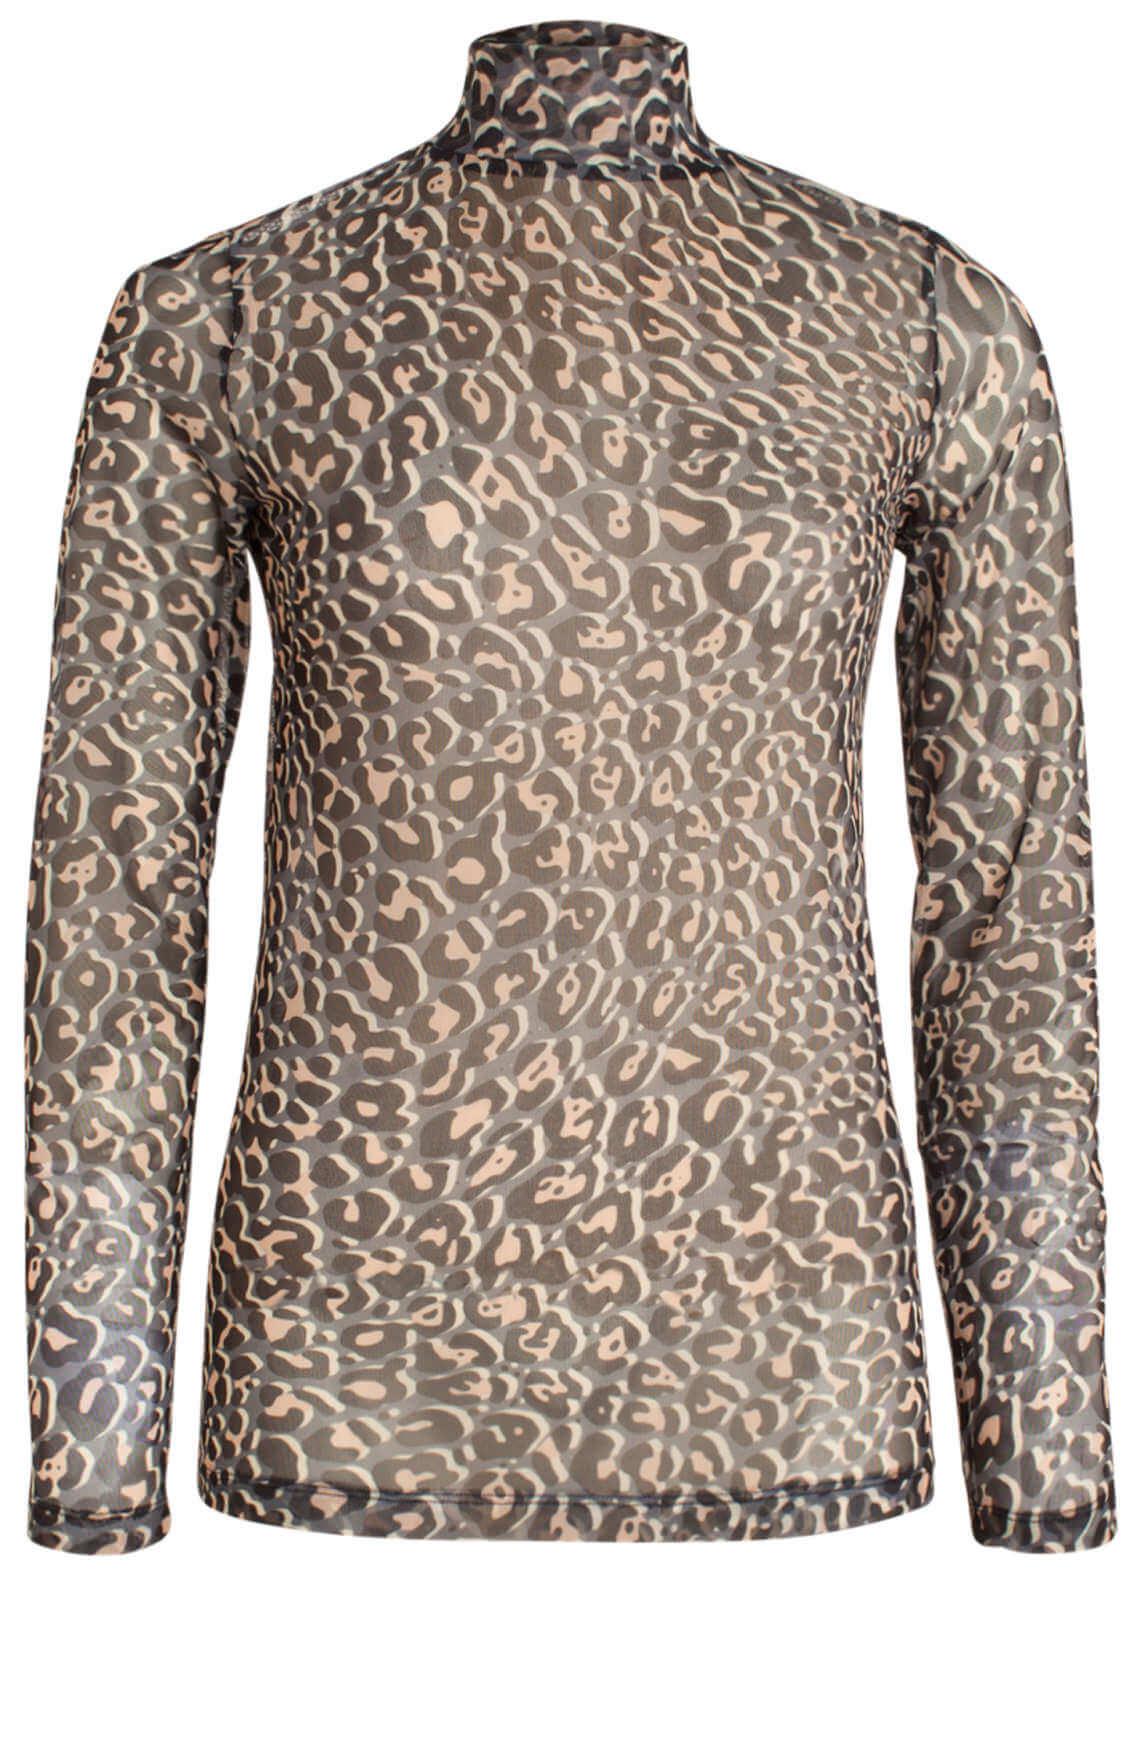 Anna Dames Mesh shirt met panterprint Grijs